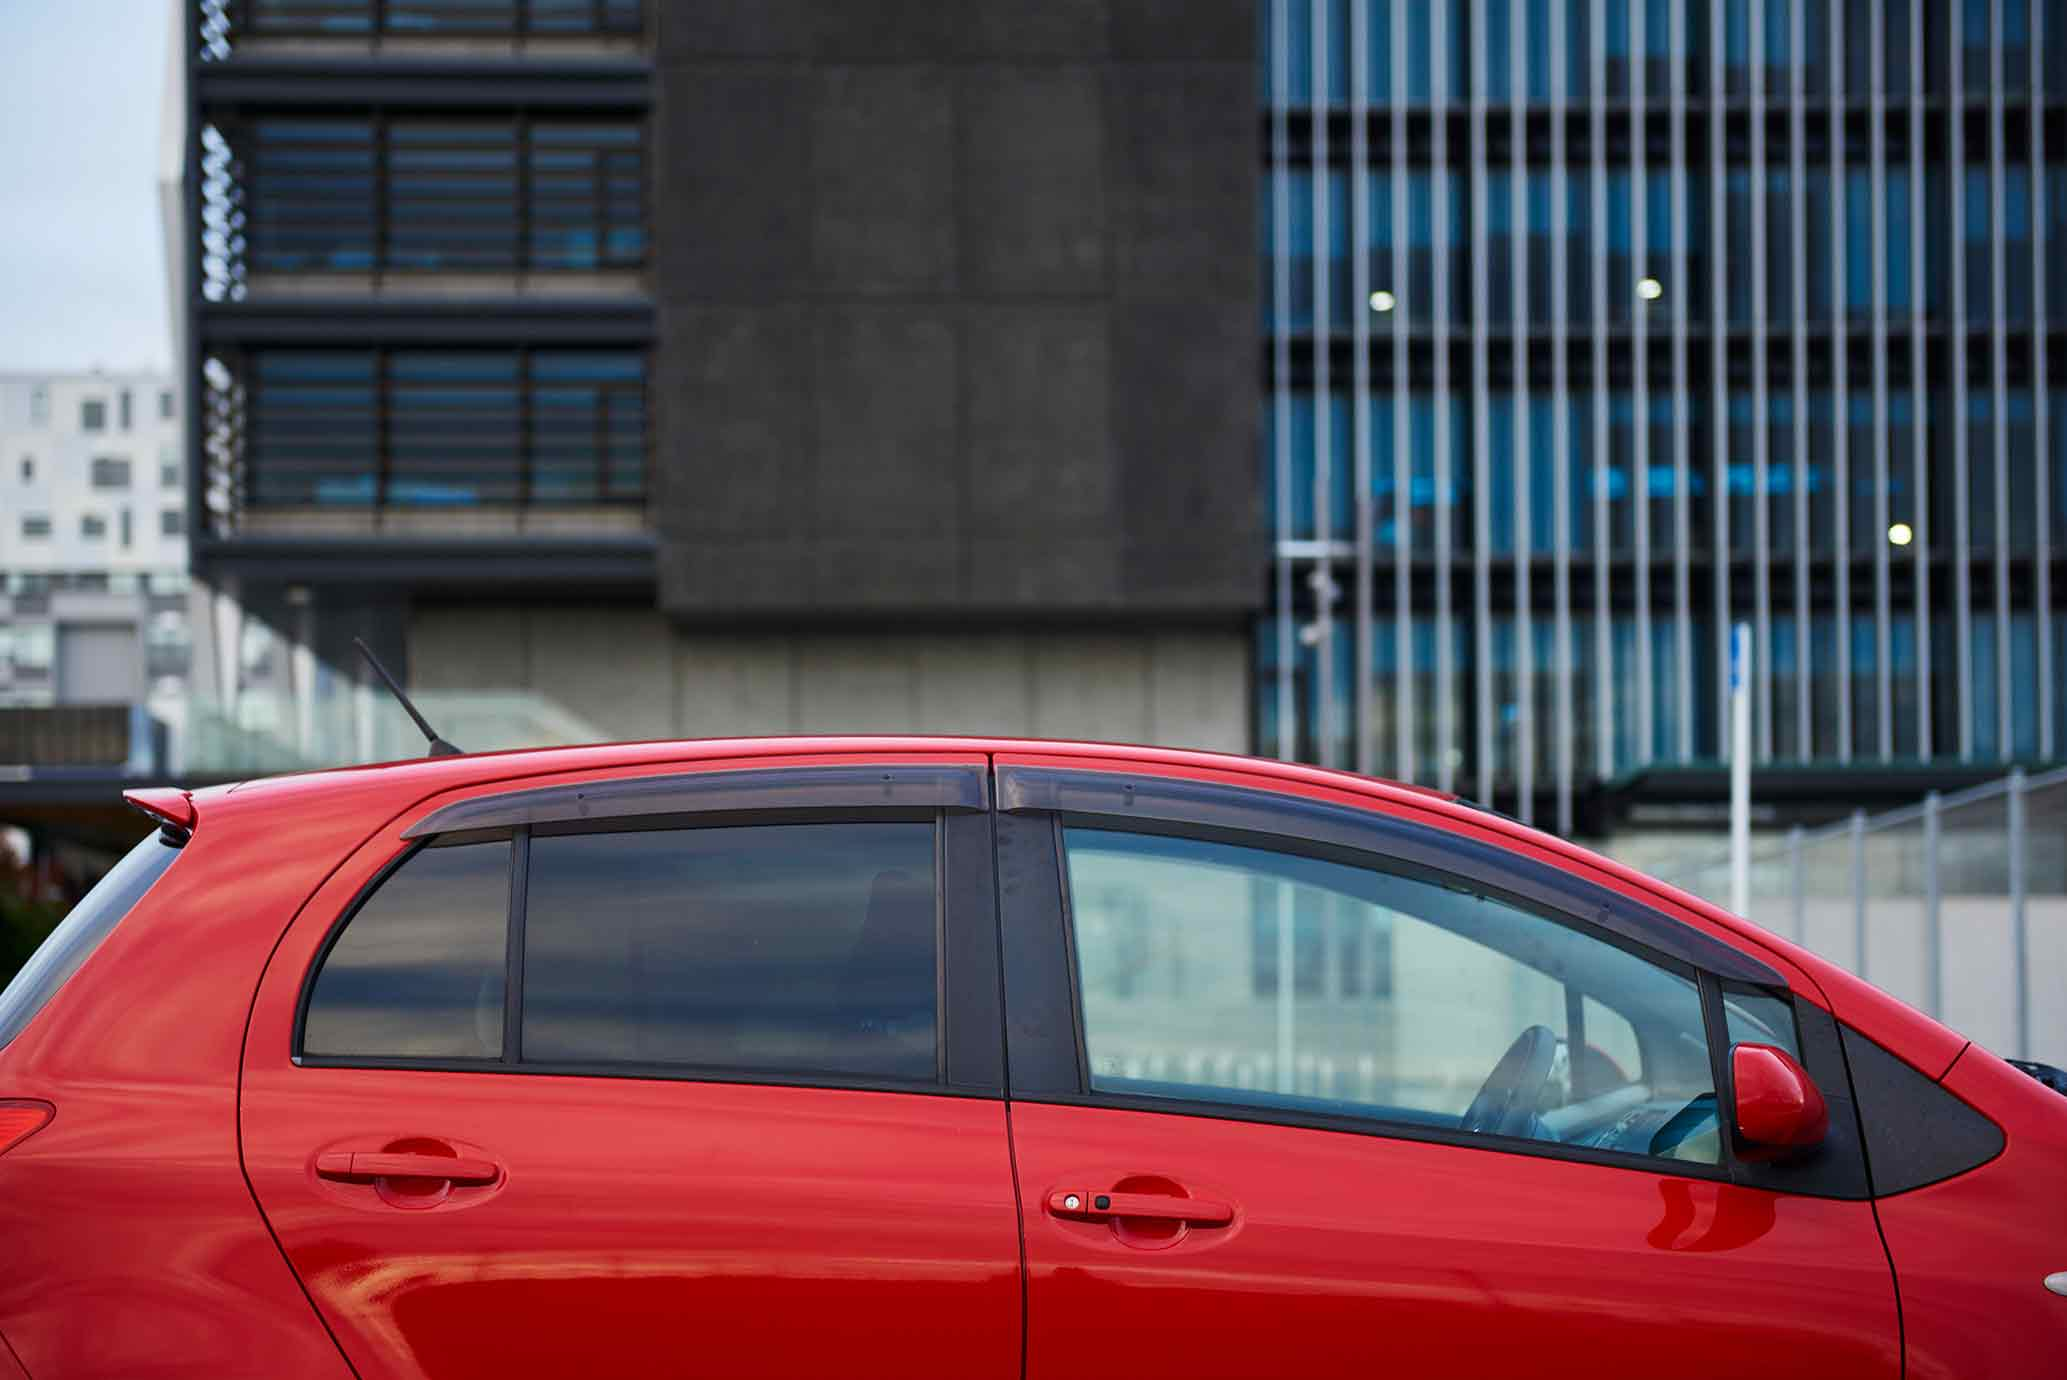 Red sedan car rental by an office building